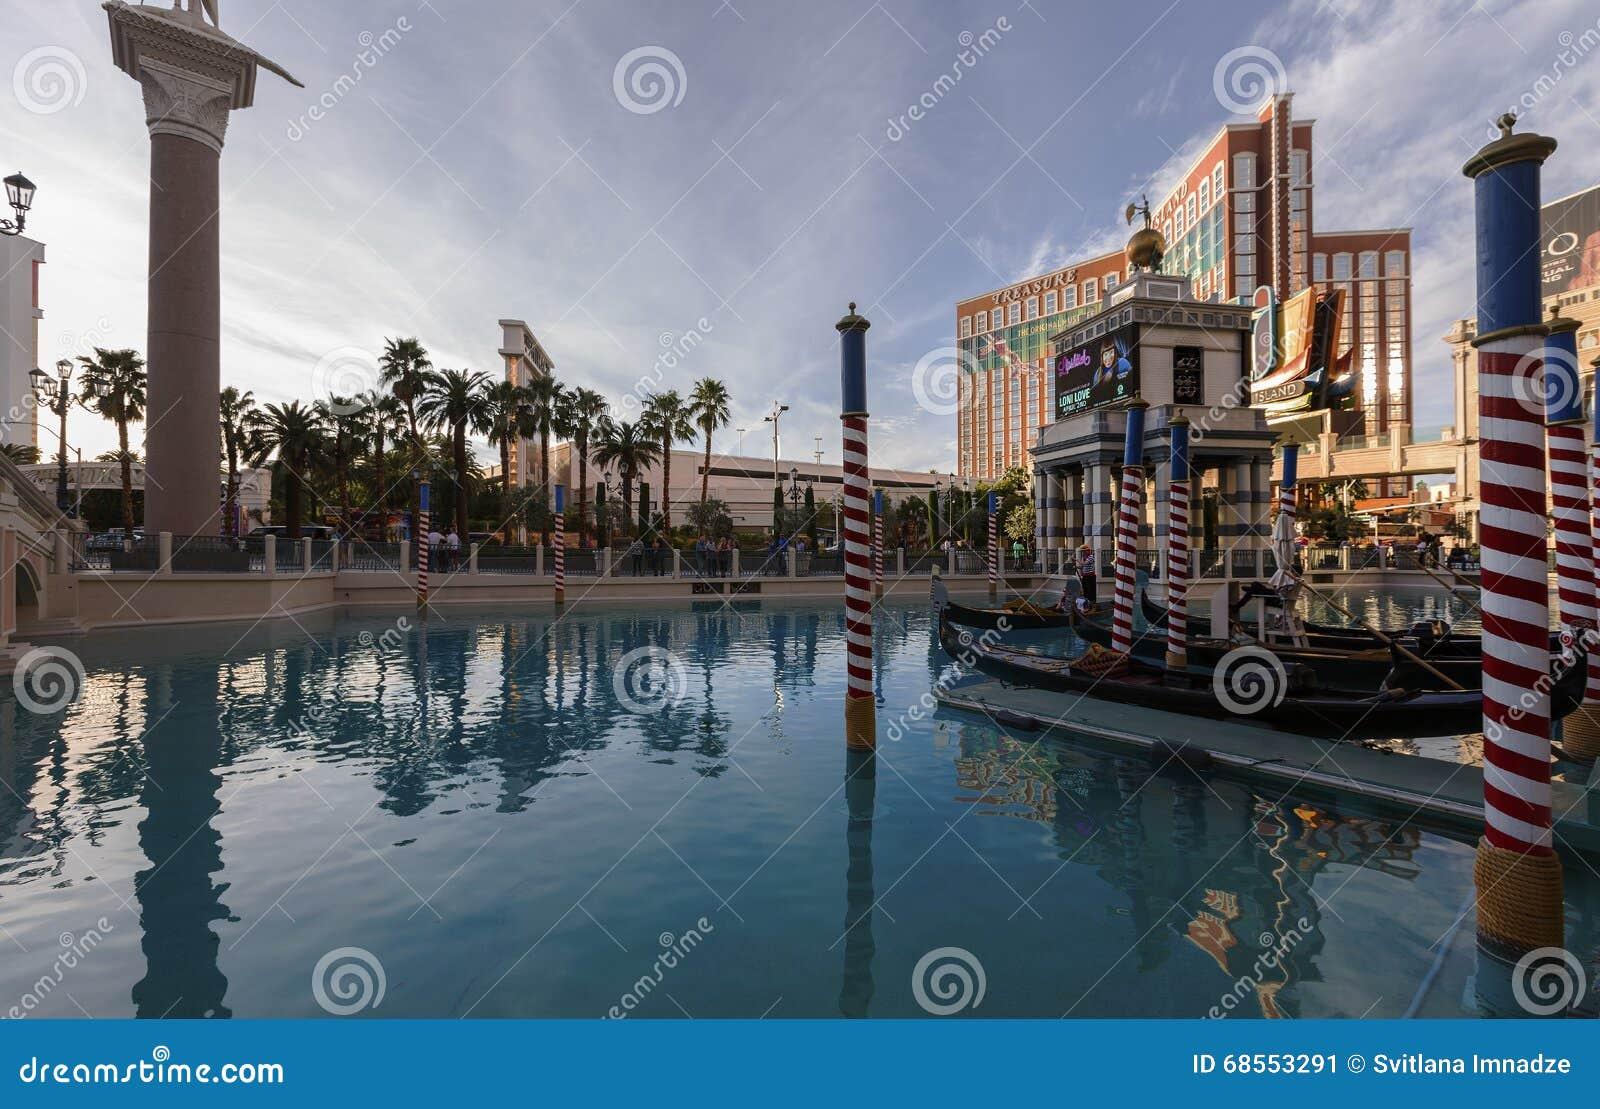 Largest casinos on vegas strip think